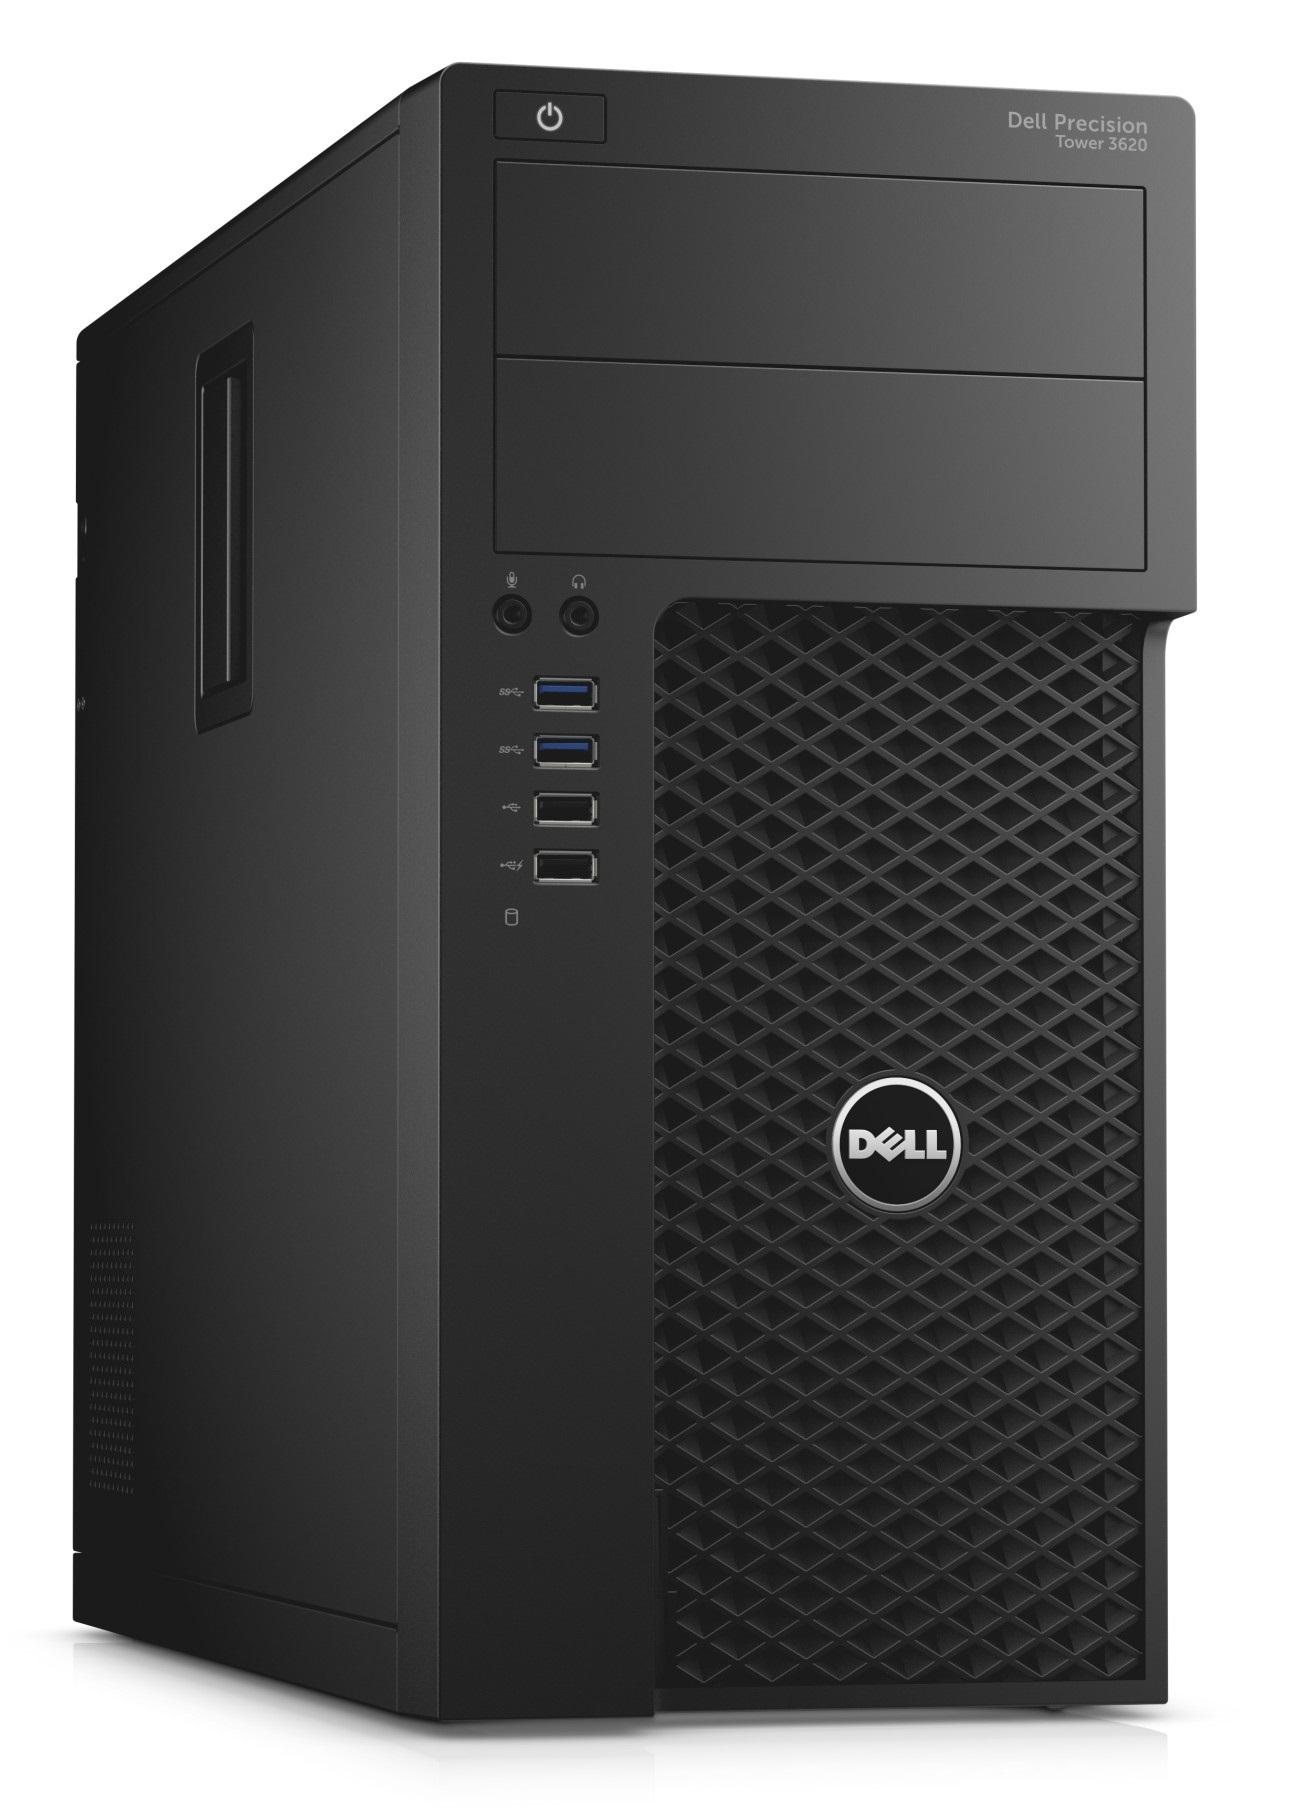 Dell Precision T3620 MT i7-6700/8G/1TB/K620-2G/DP/W7P+W10P/5R NBD